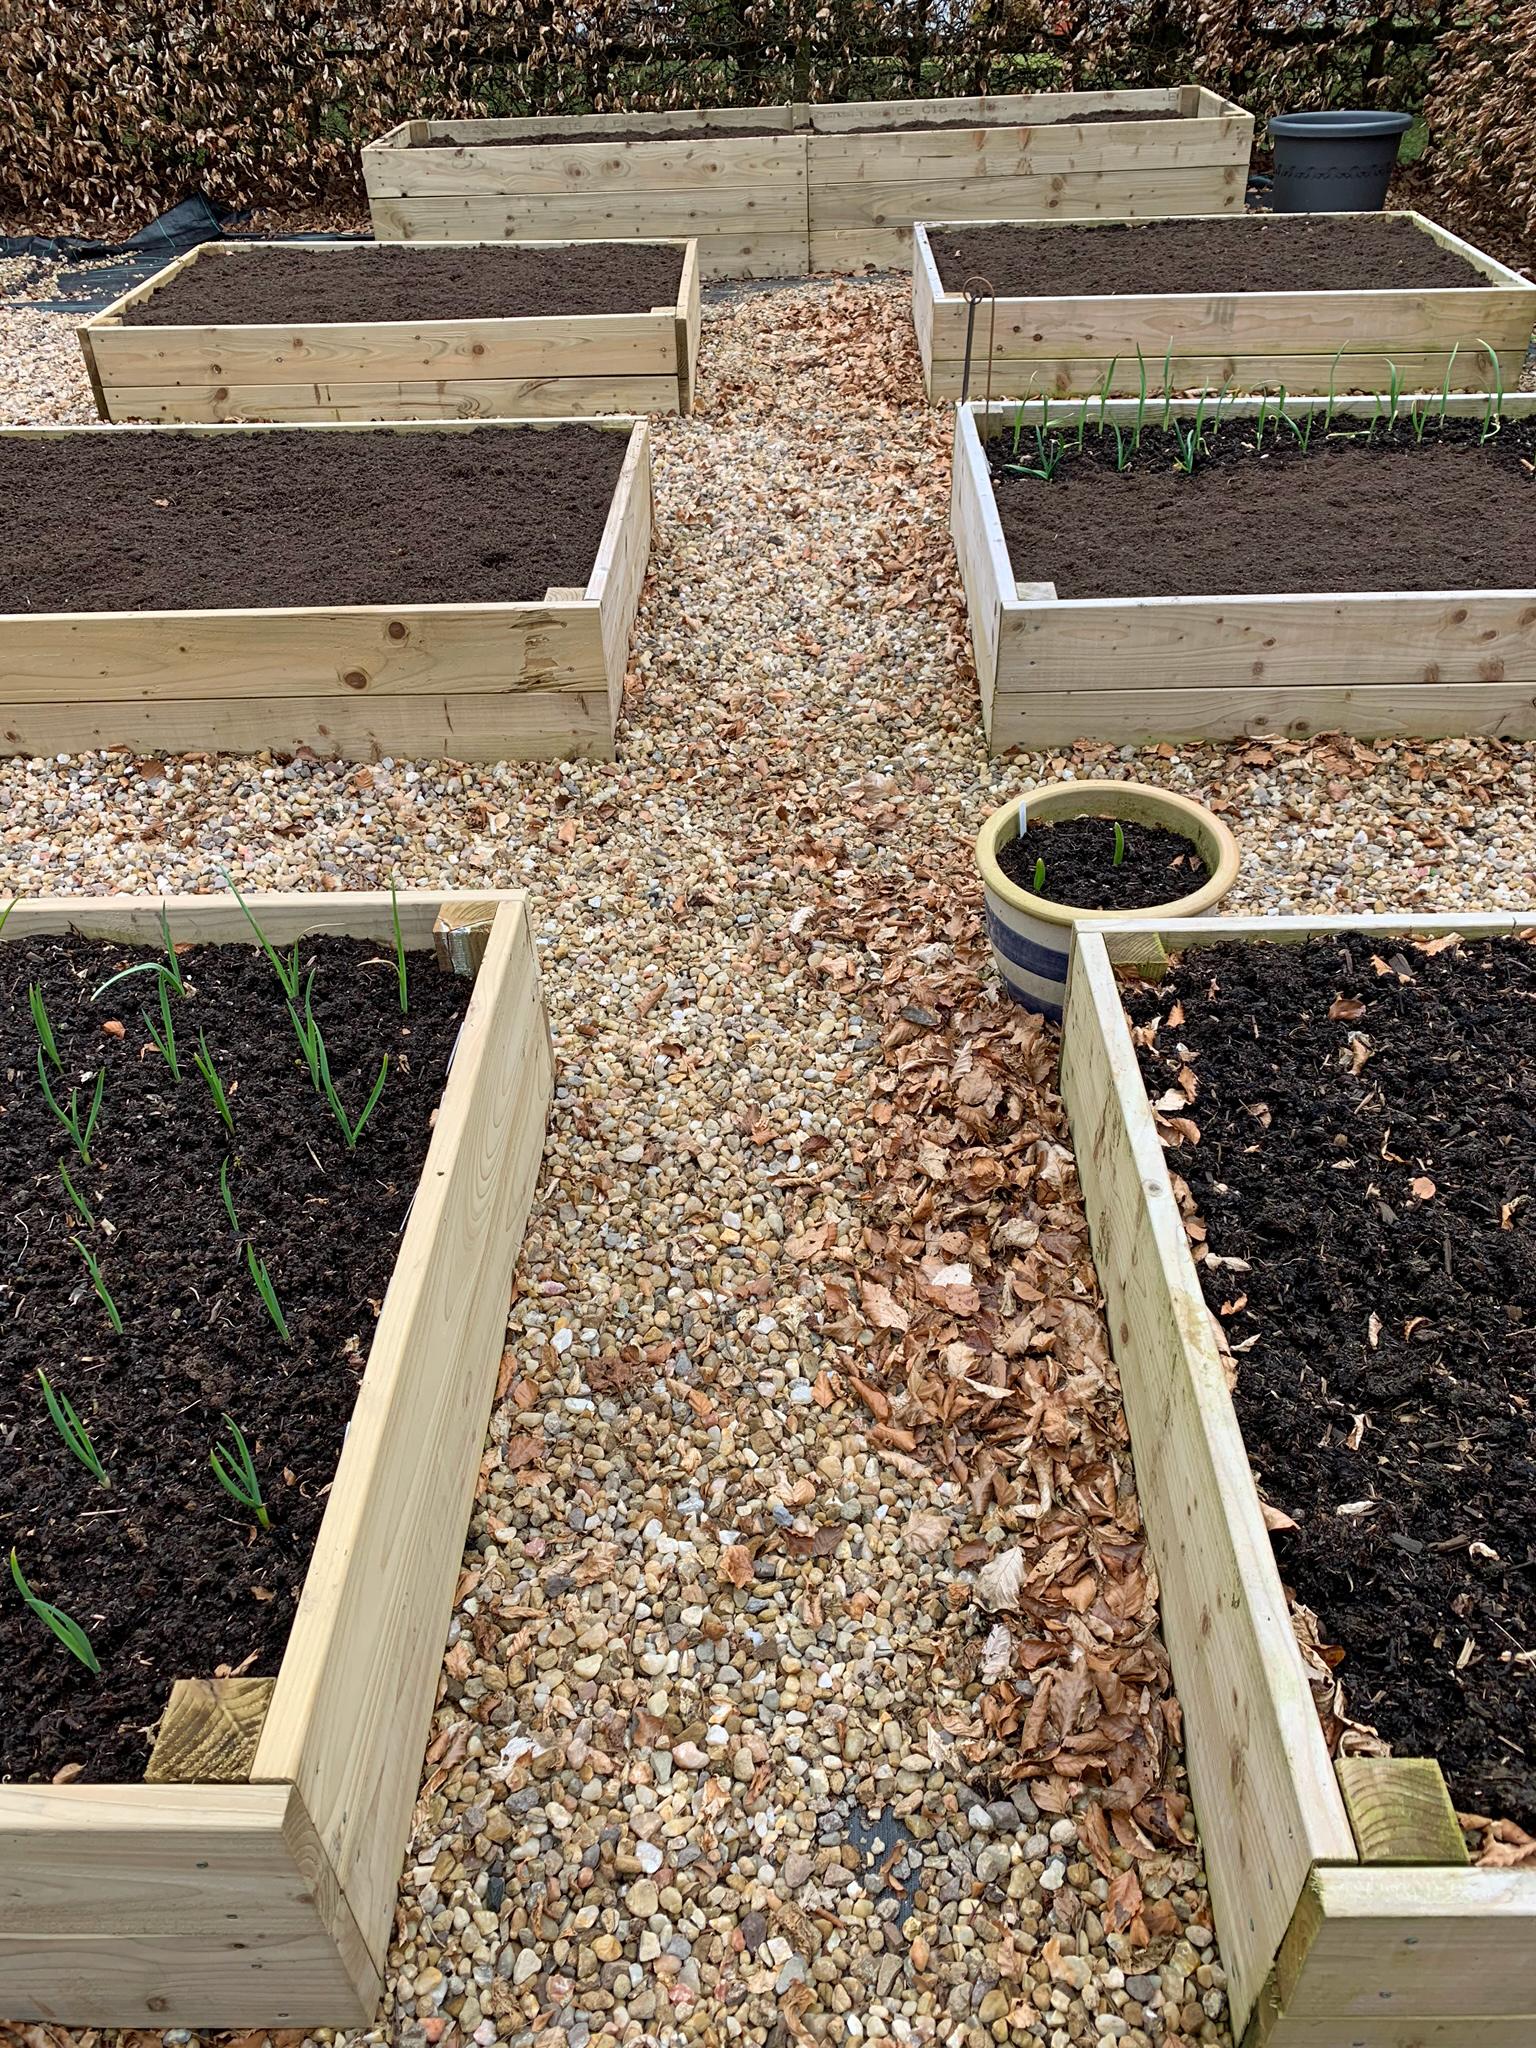 2019 Kitchen Garden Plans & Projects